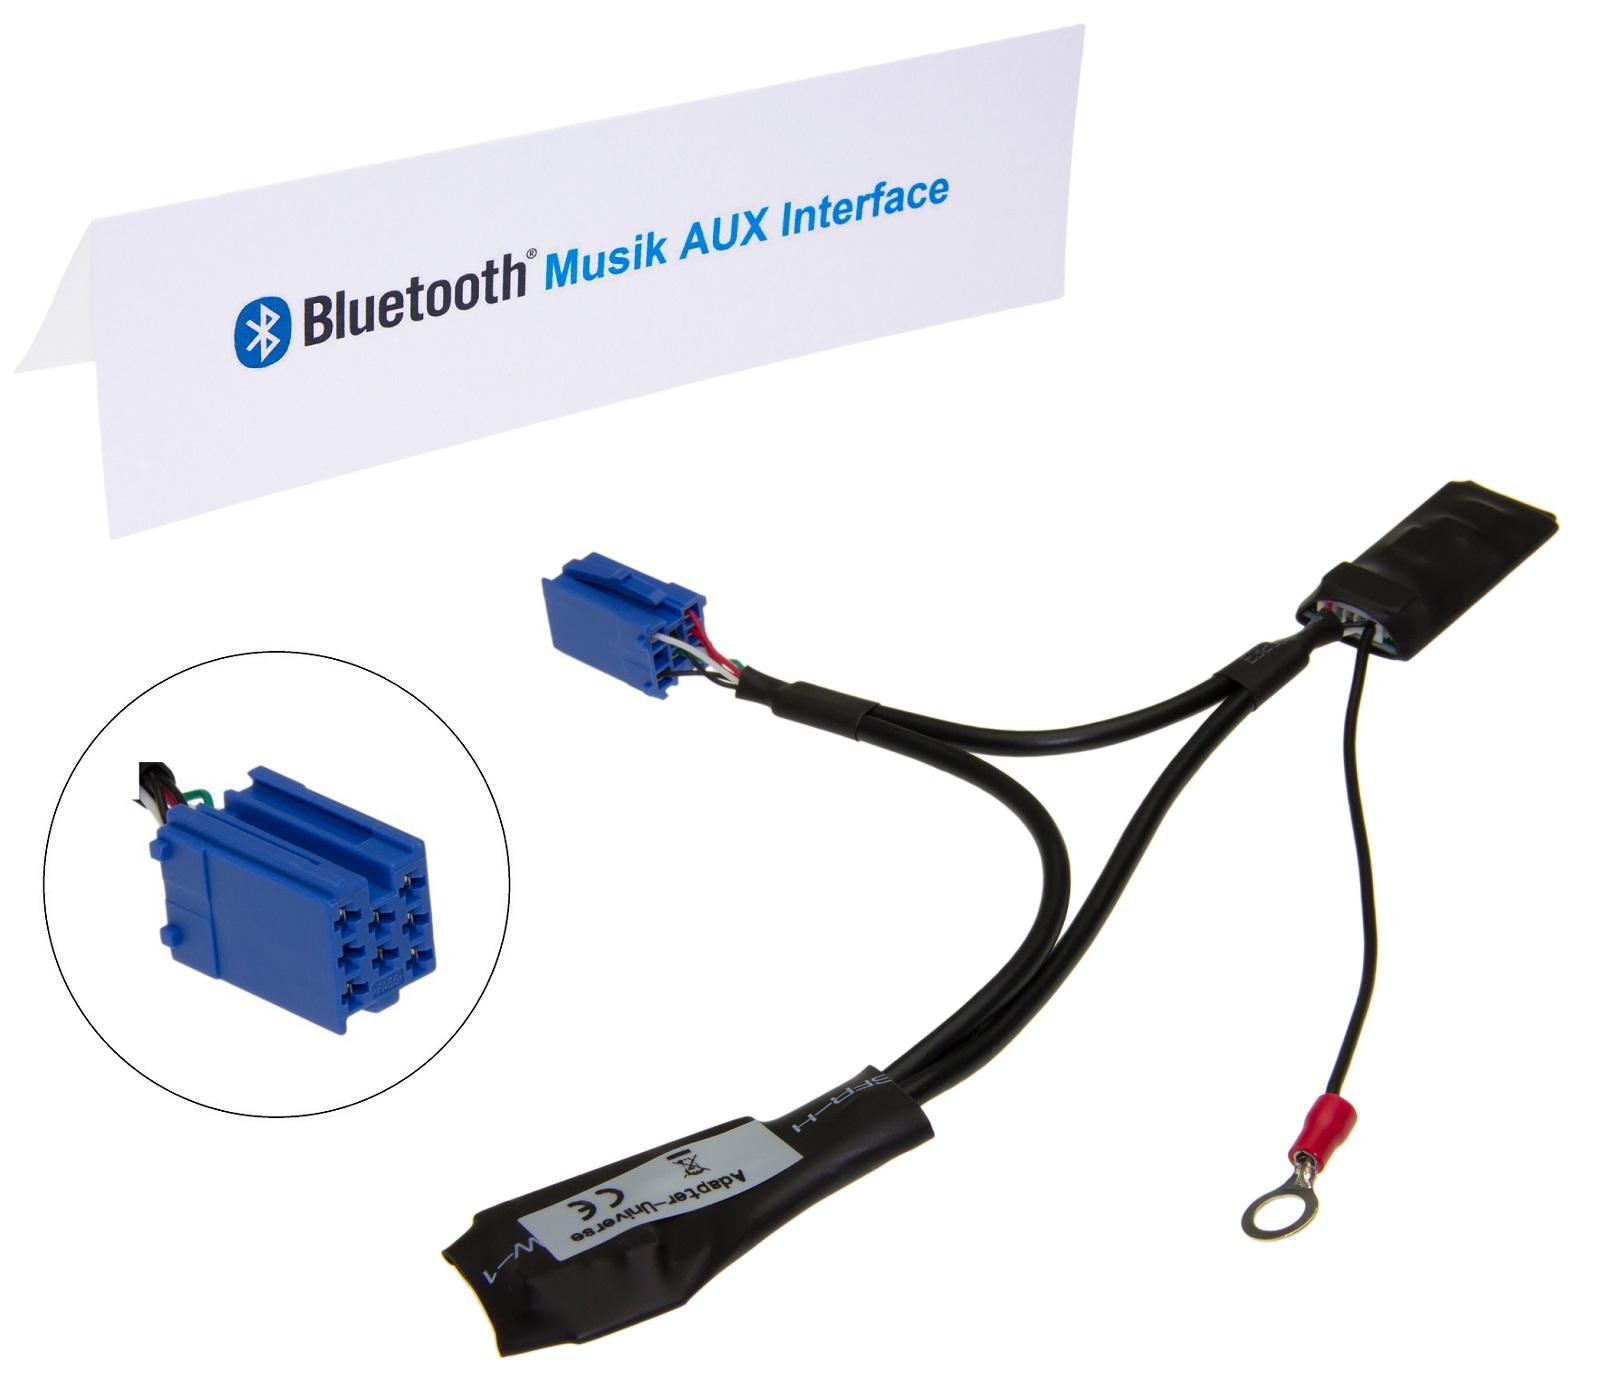 kfz auto radio bluetooth modul aux interface 8pol mini iso. Black Bedroom Furniture Sets. Home Design Ideas